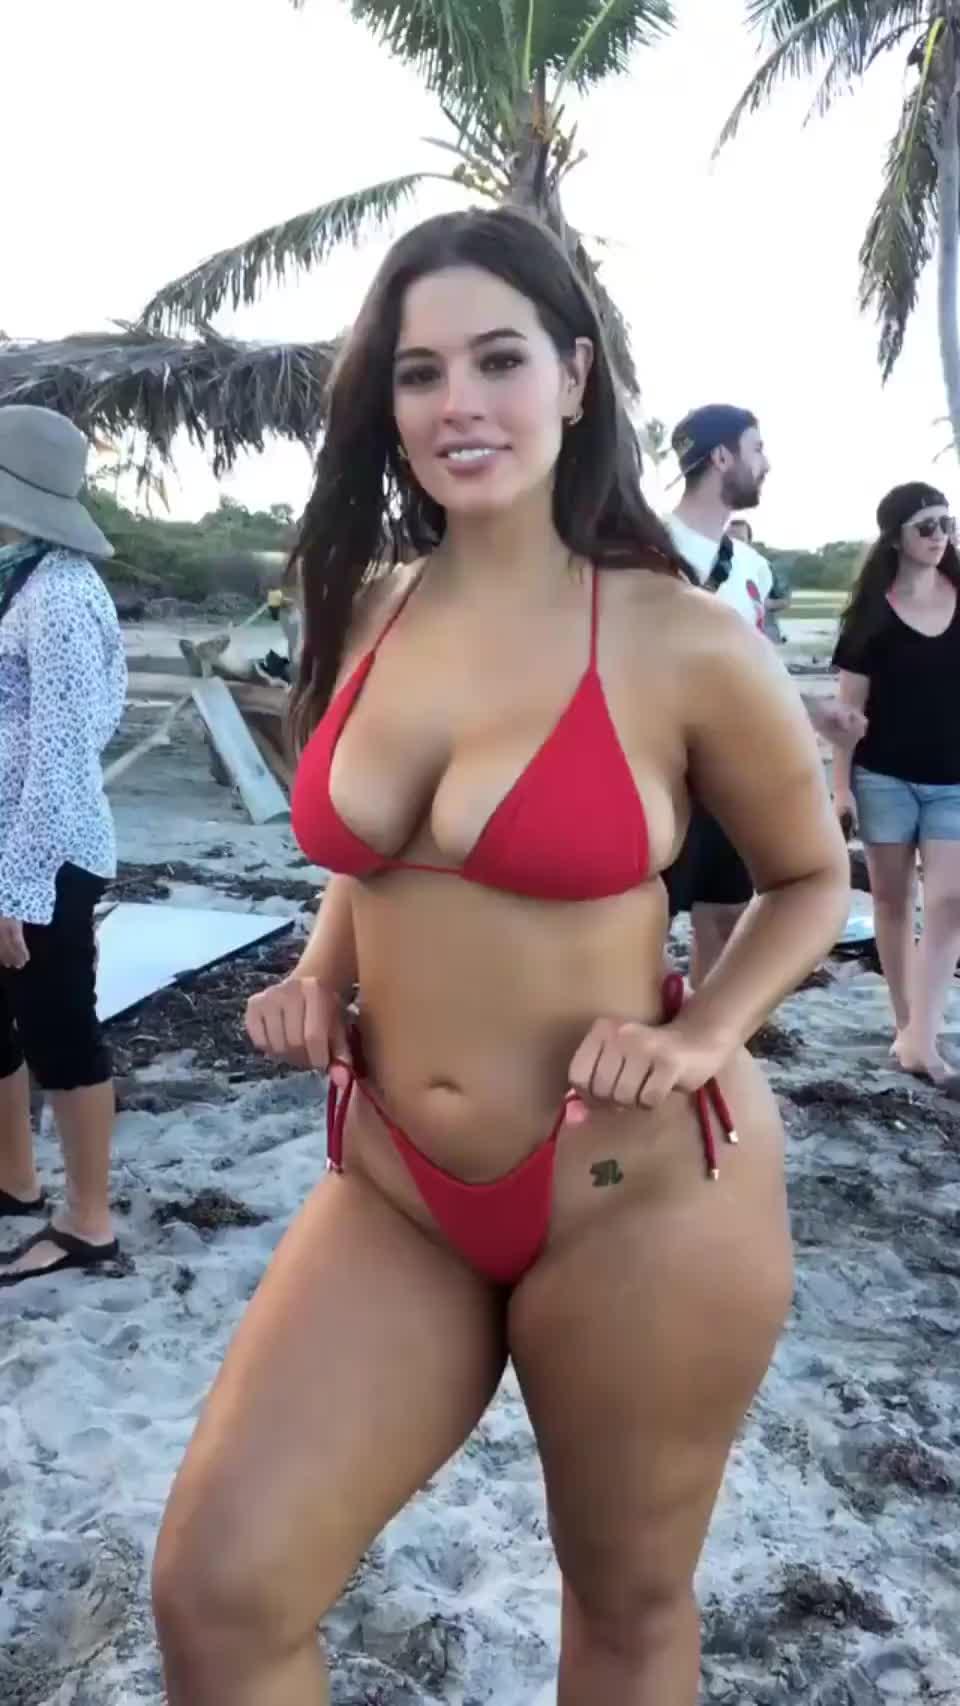 Ashley Graham in a tiny bikini